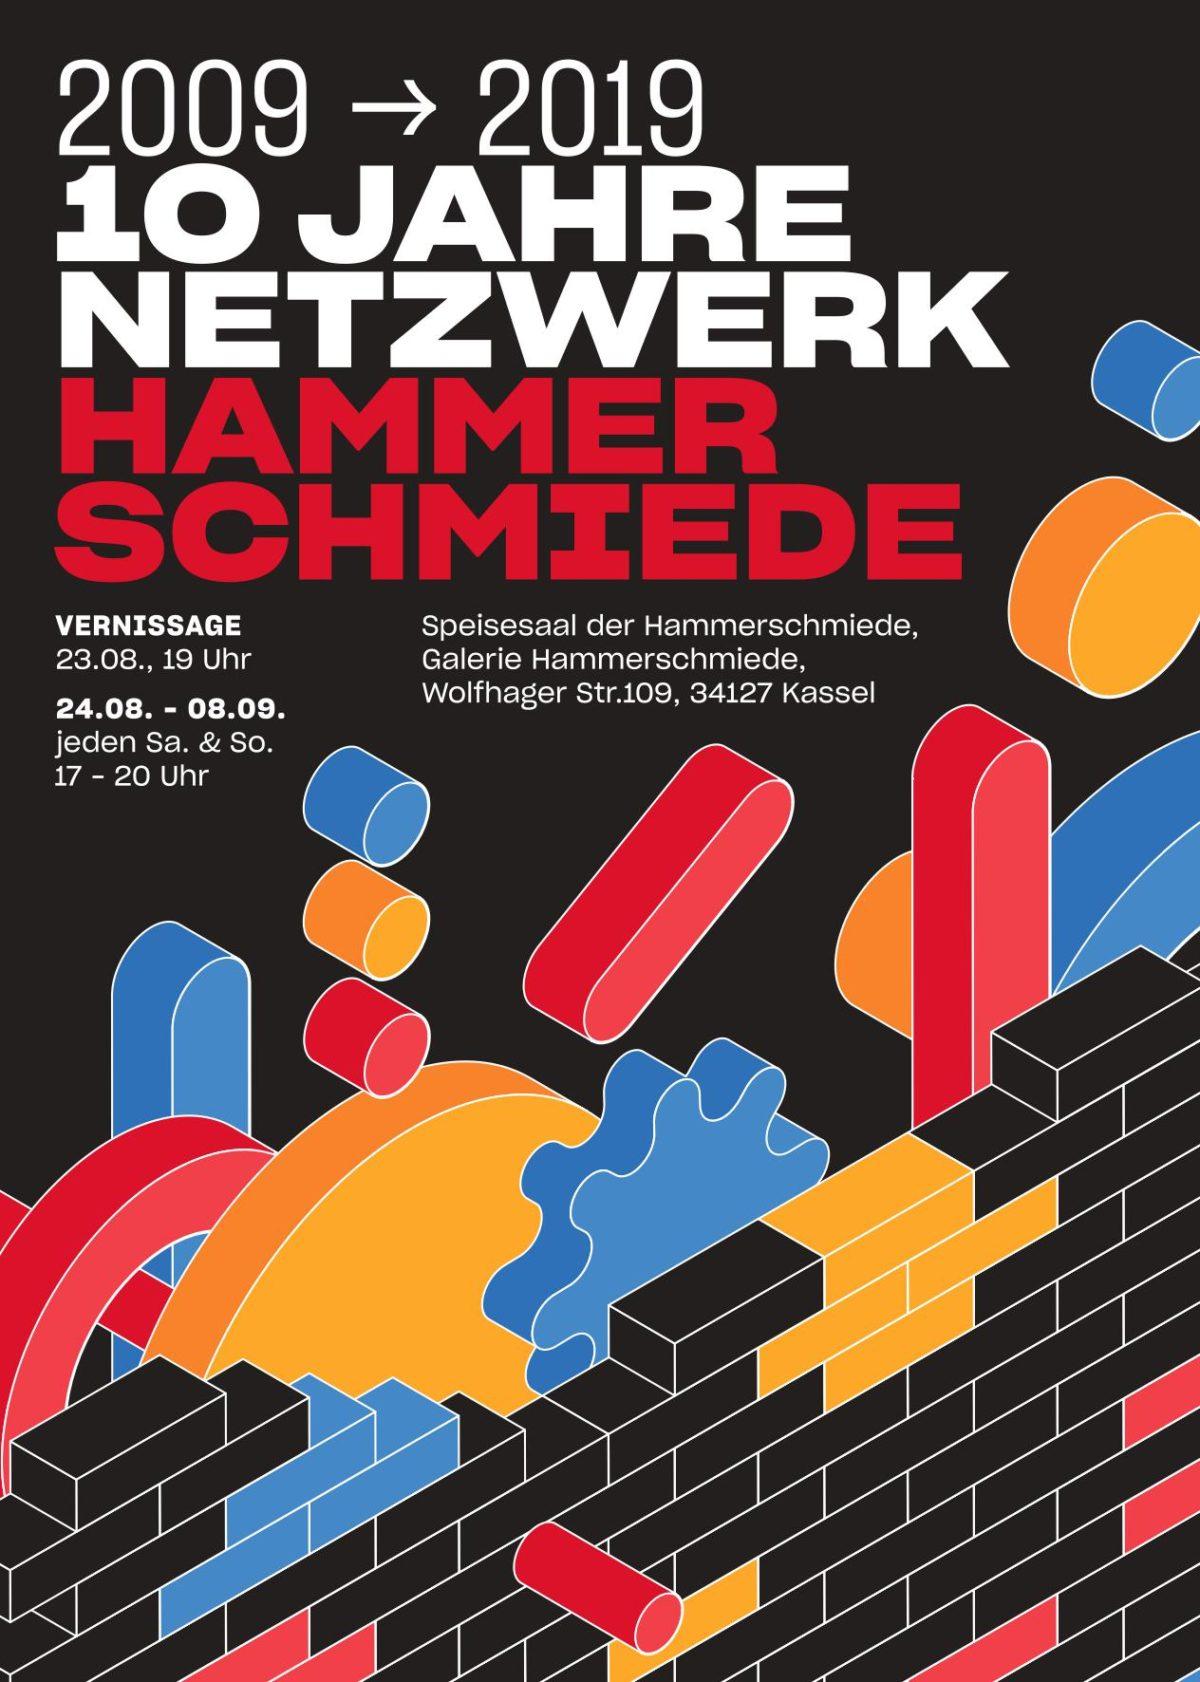 Netzwerk Hammerschmiede: Ausstellung zum zehnjährigem Vereinsjubiläum